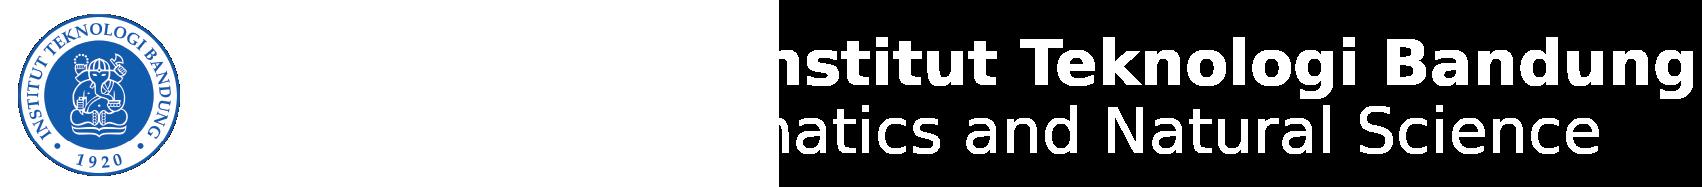 Matematika – Institut Teknologi Bandung -